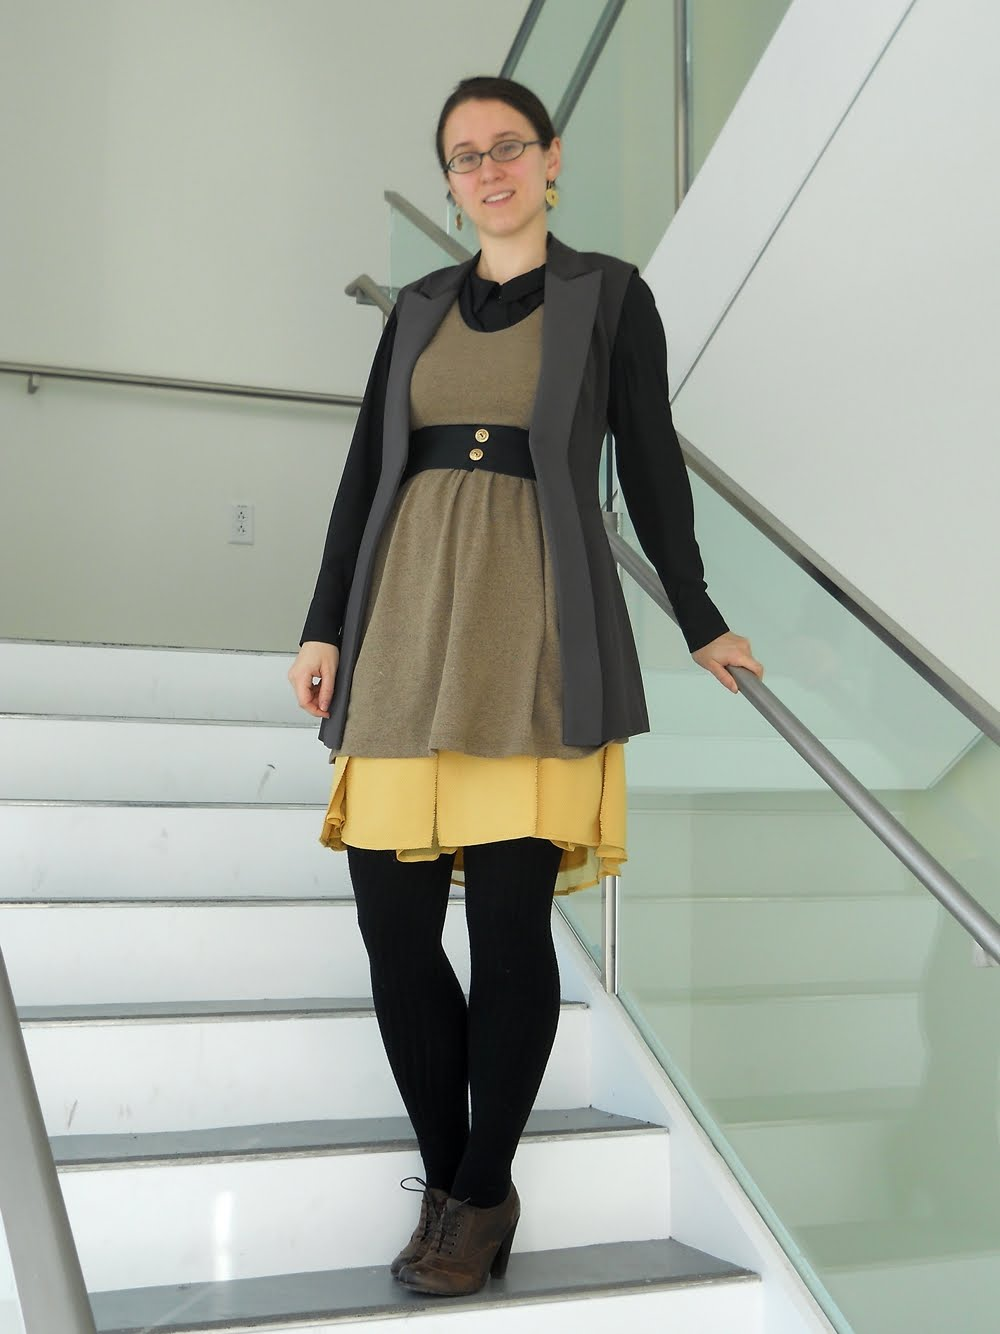 feminine mens clothing - photo #39